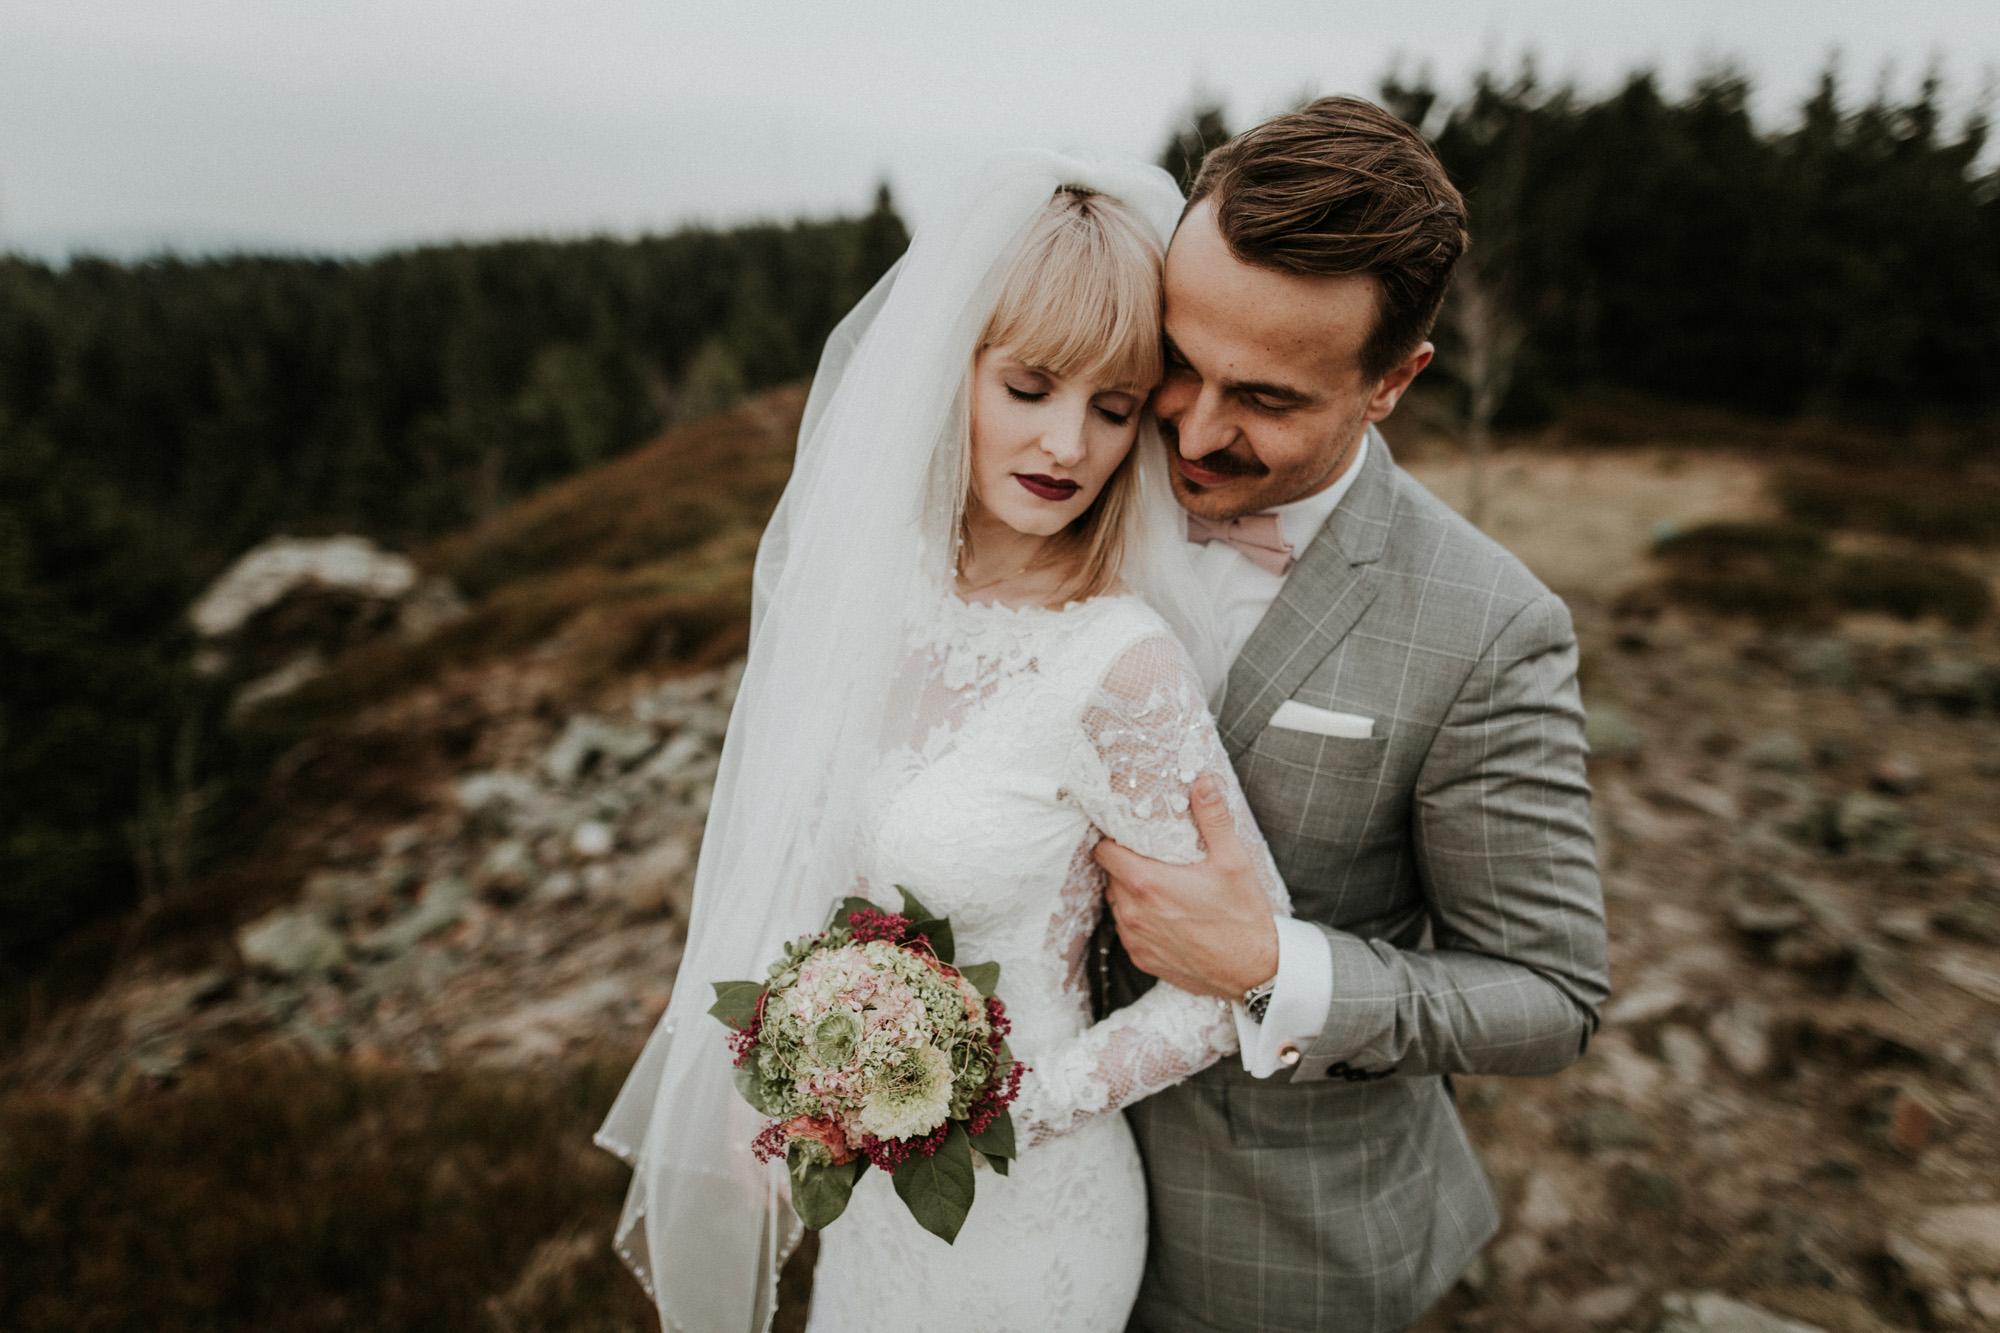 DanielaMarquardtPhotography_Hochzeitsfotograf_Düsseldorf_Köln_Mallorca_Bayern_Austria_Harz_LinaundMaik_Afterwedding-Shooting_Weddingphotographer_Ibiza_Tuskany_Italien_Toskana39